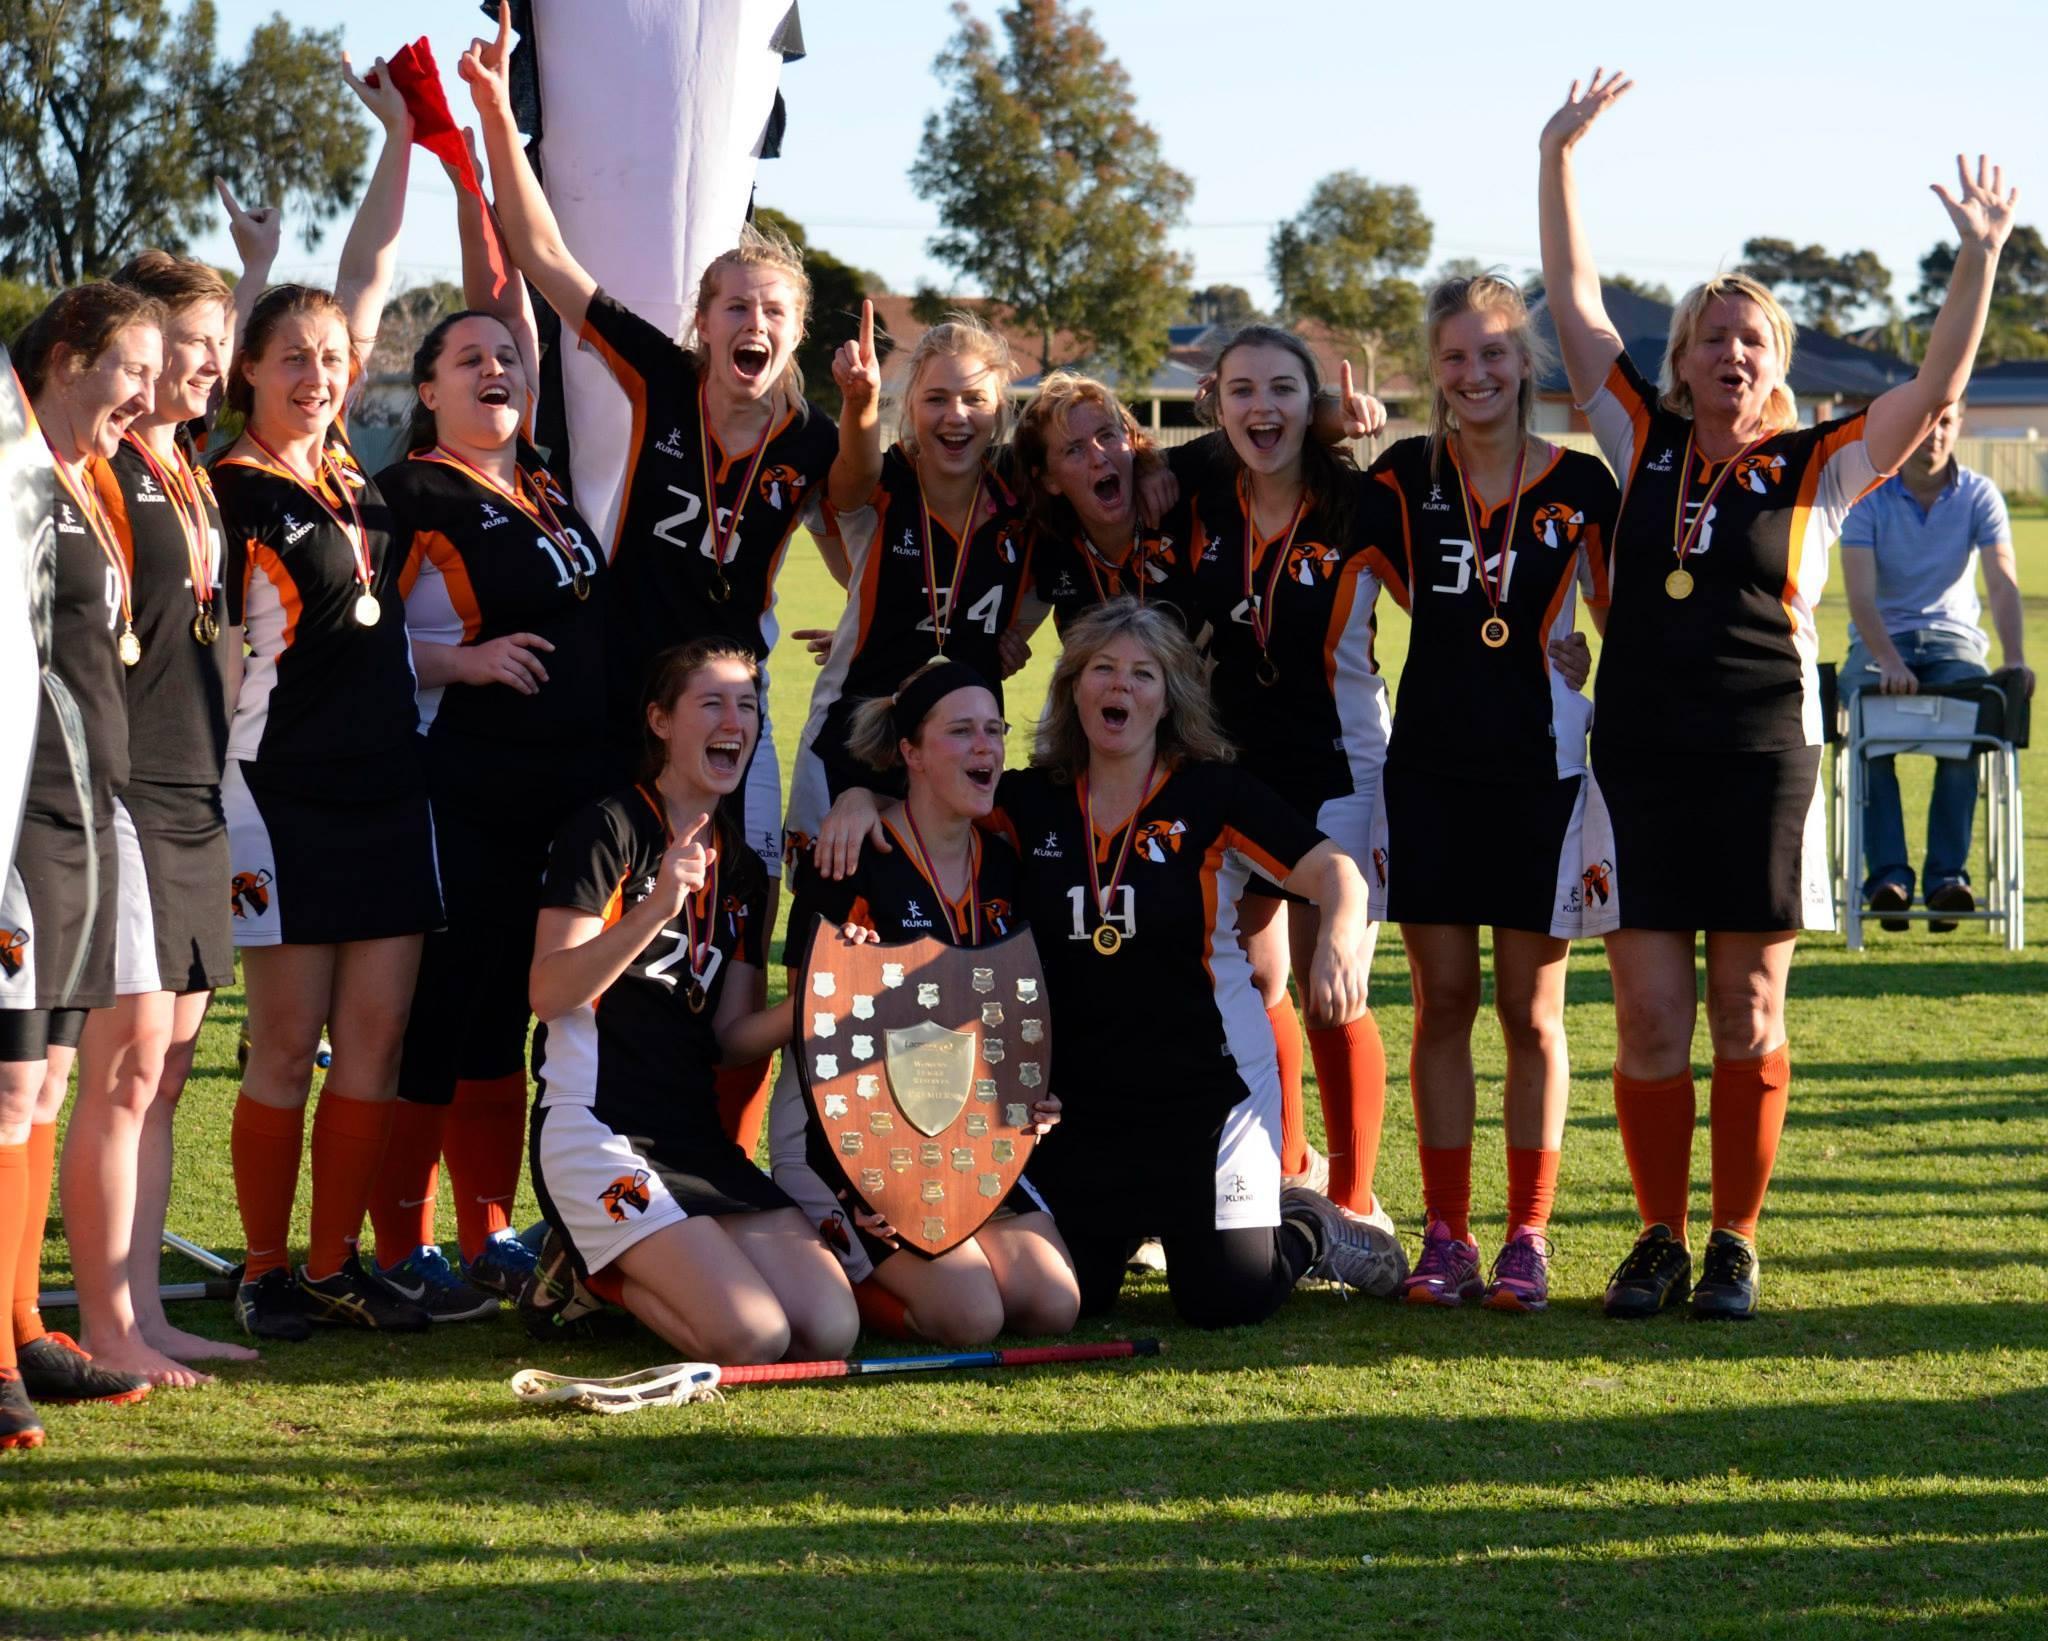 Adelaide University Lacrosse Club